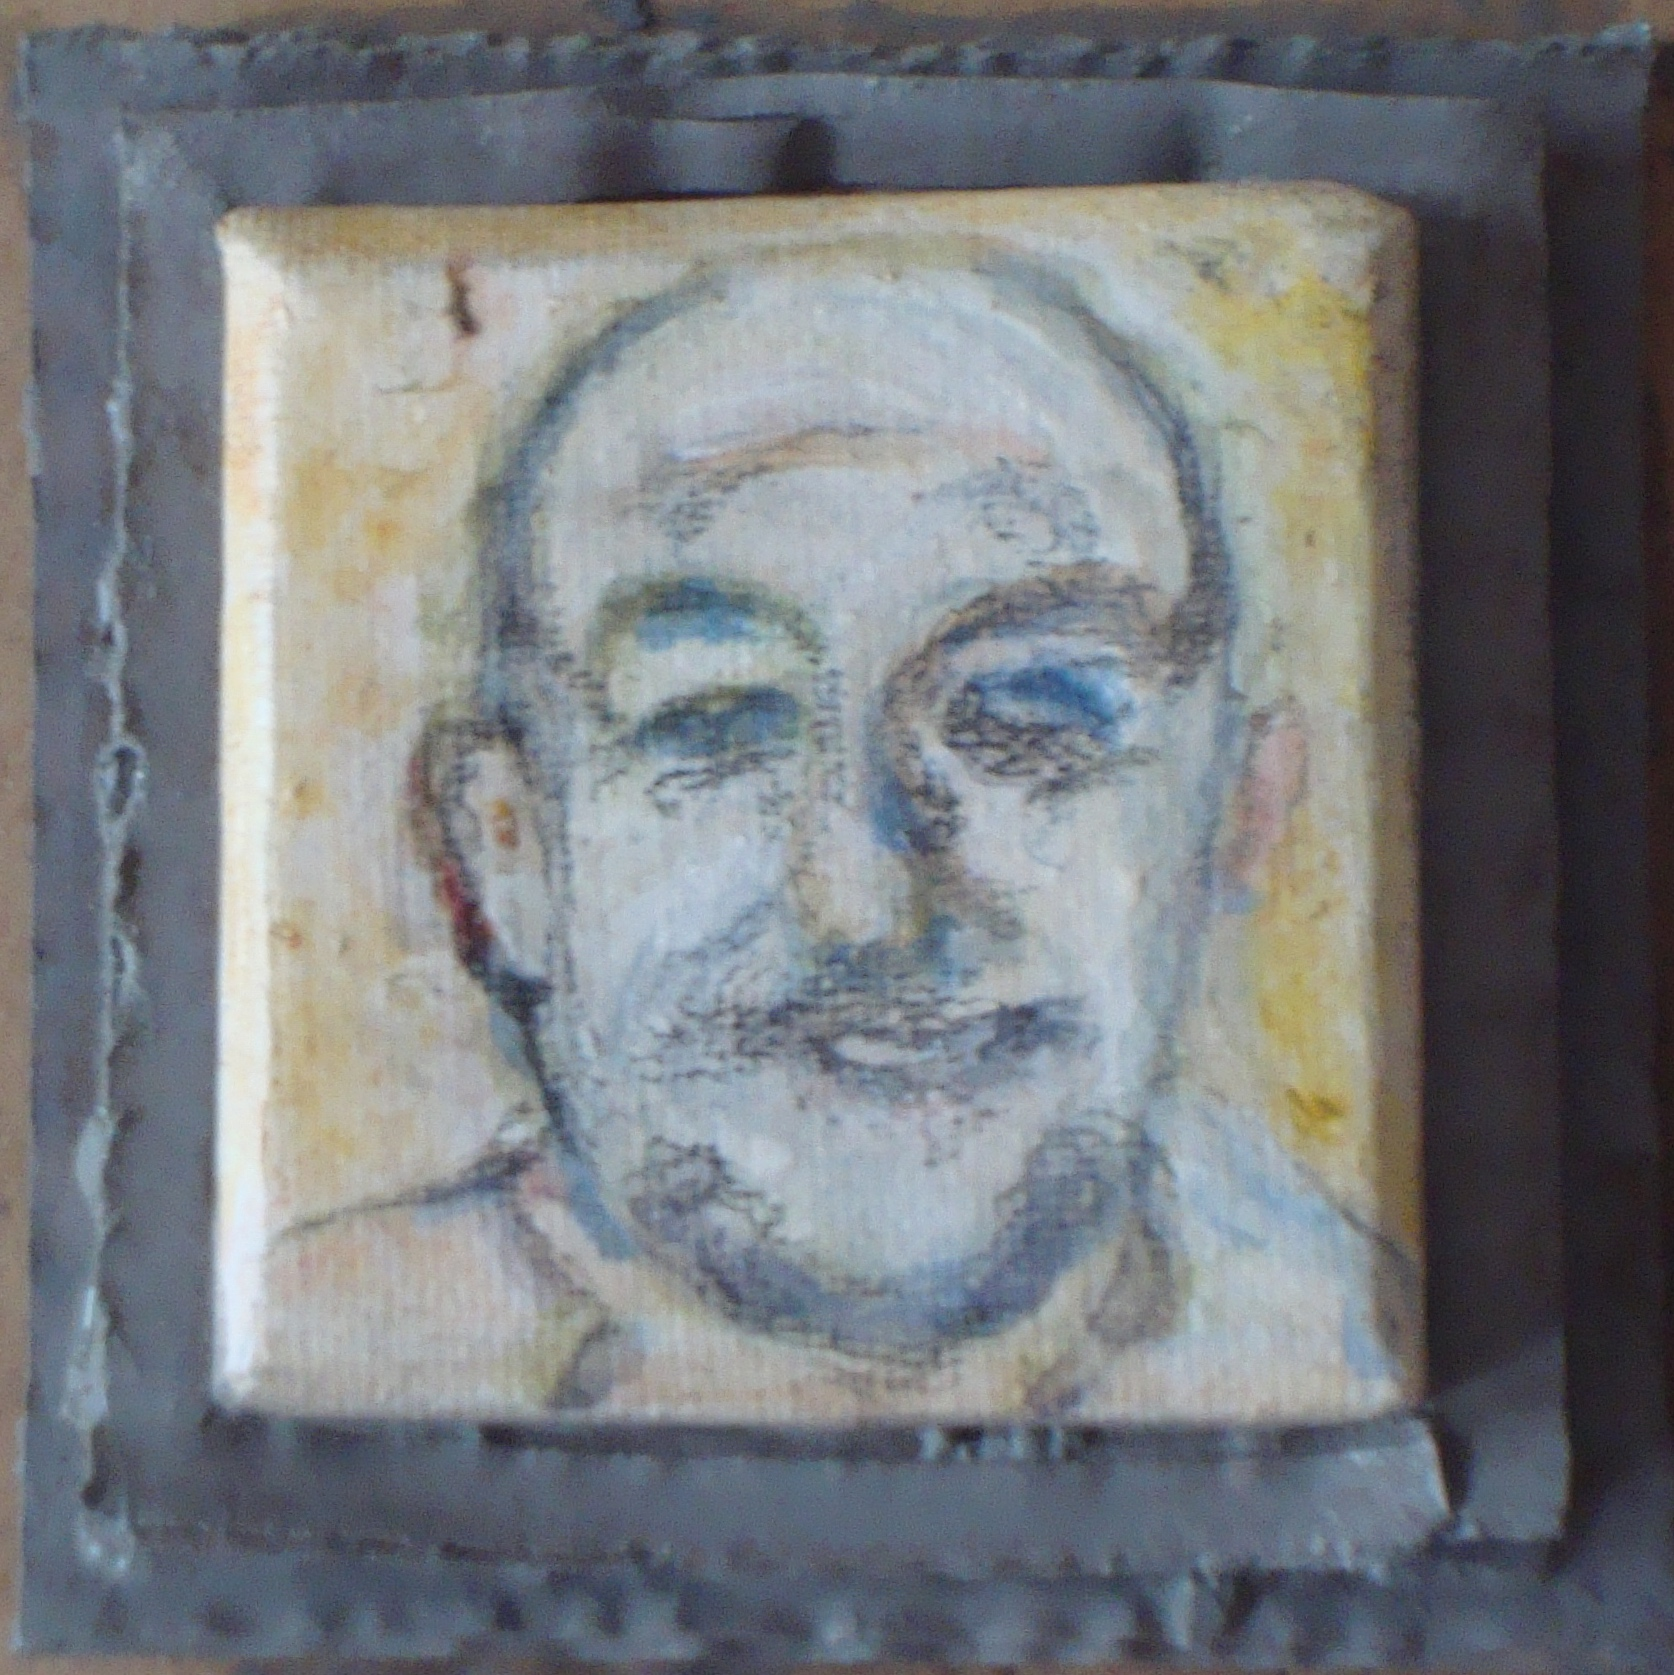 5 x 5 cm Leinwand auf Rahmen